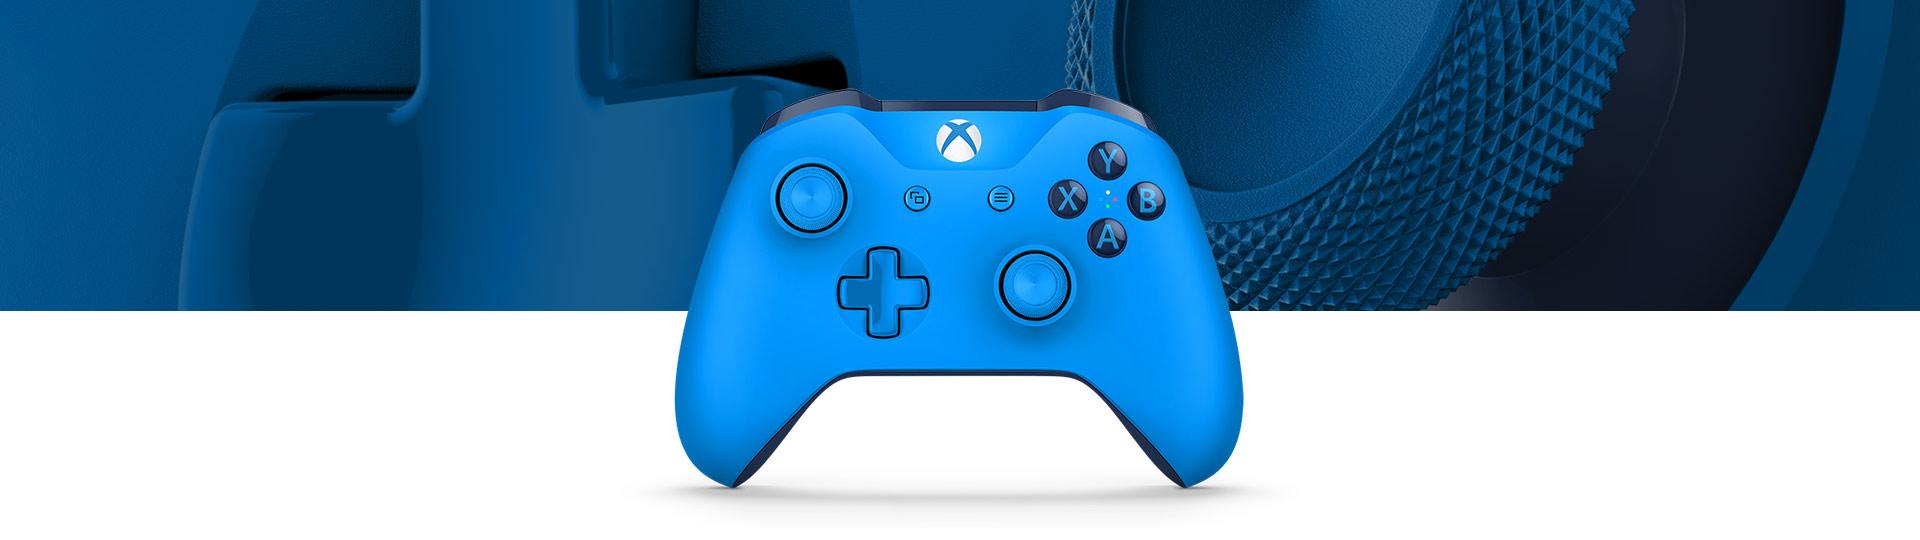 Controller Wireless Blu